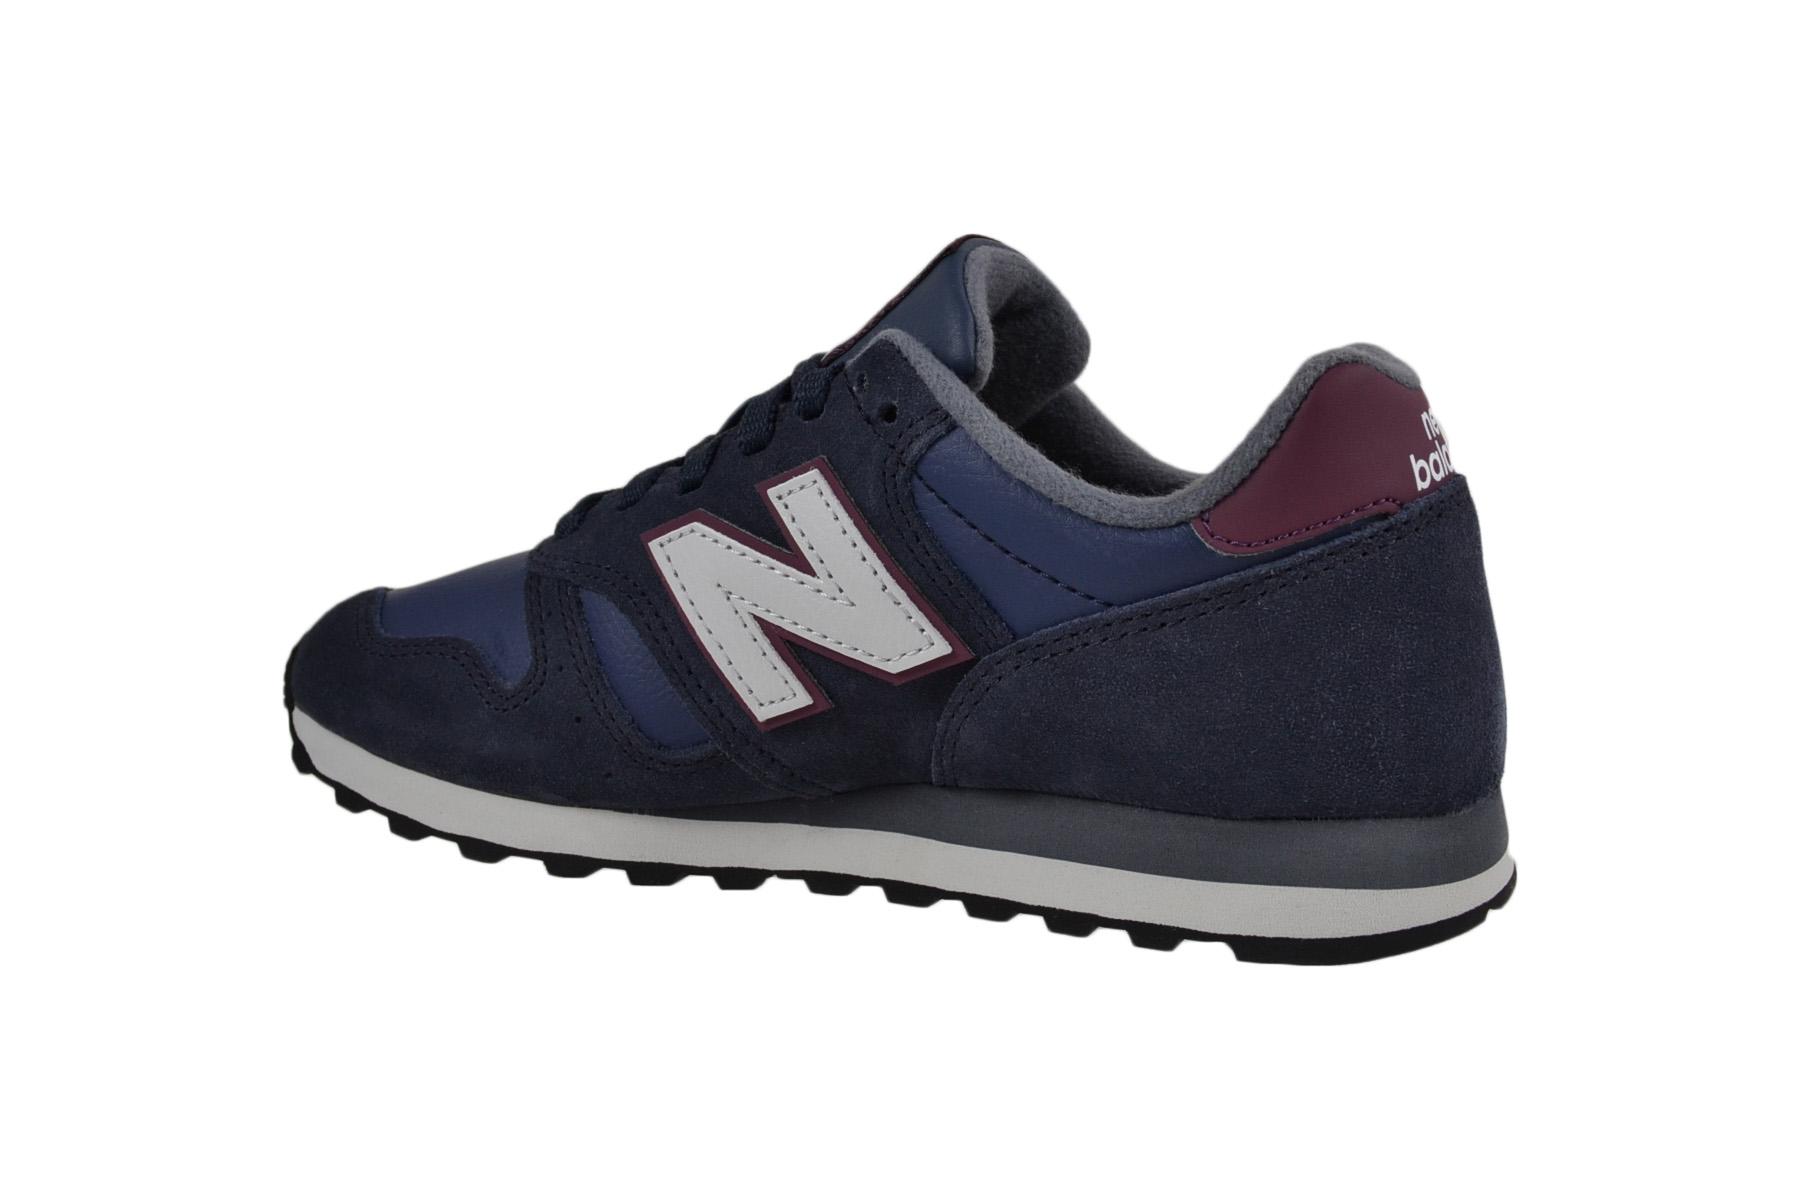 New Balance ML373 NSR navy red Schuhe Sneaker